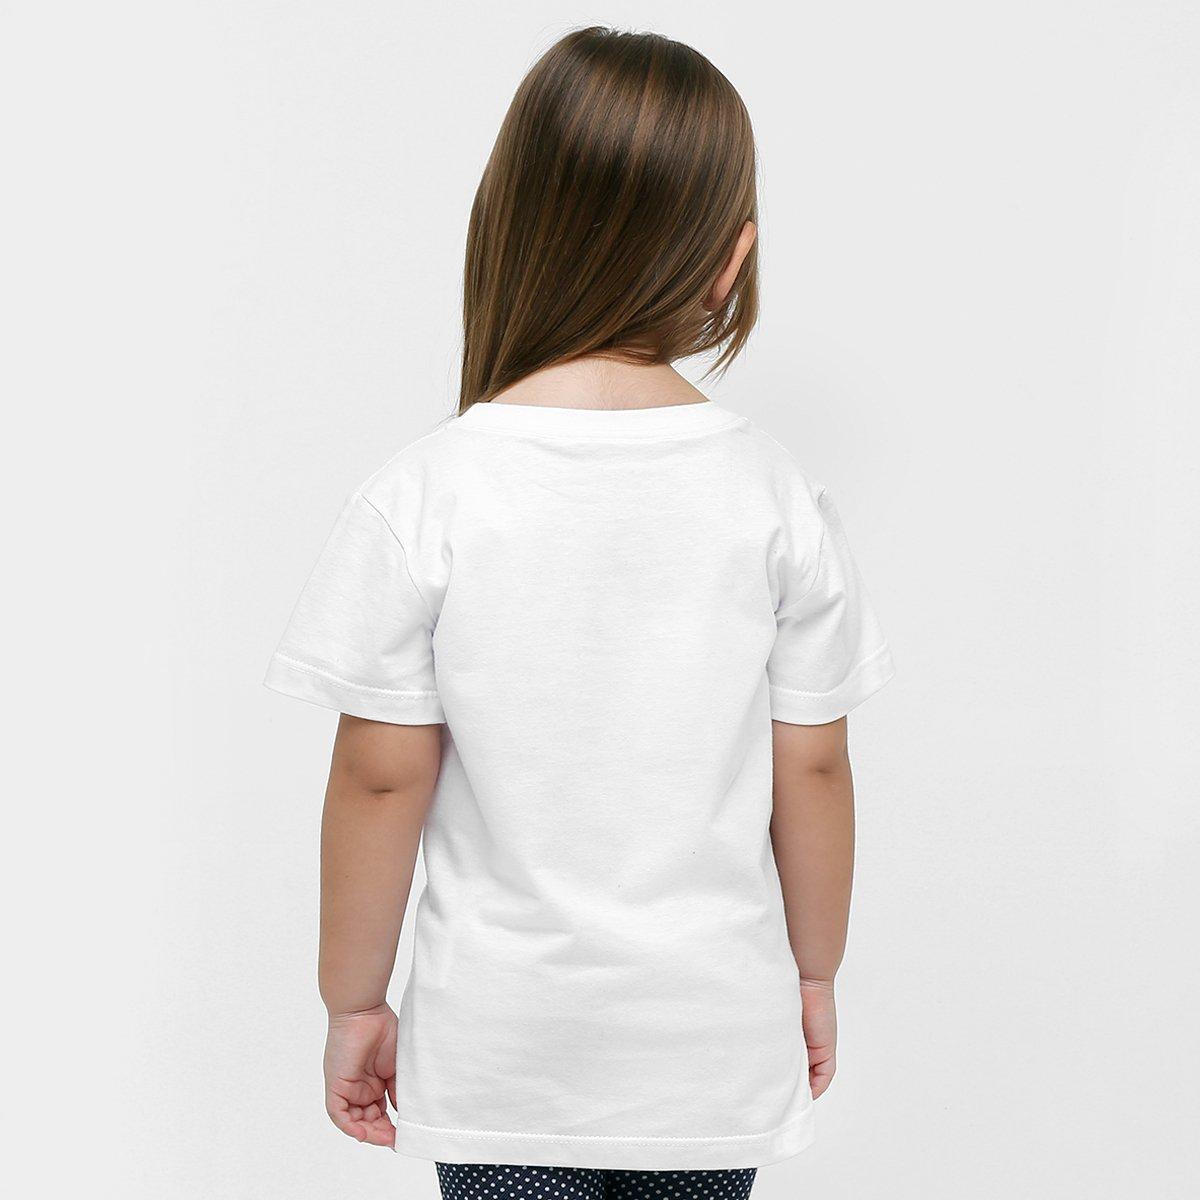 Infantil Pua Branco Camiseta Moana Camiseta Moana WgvPISgOw